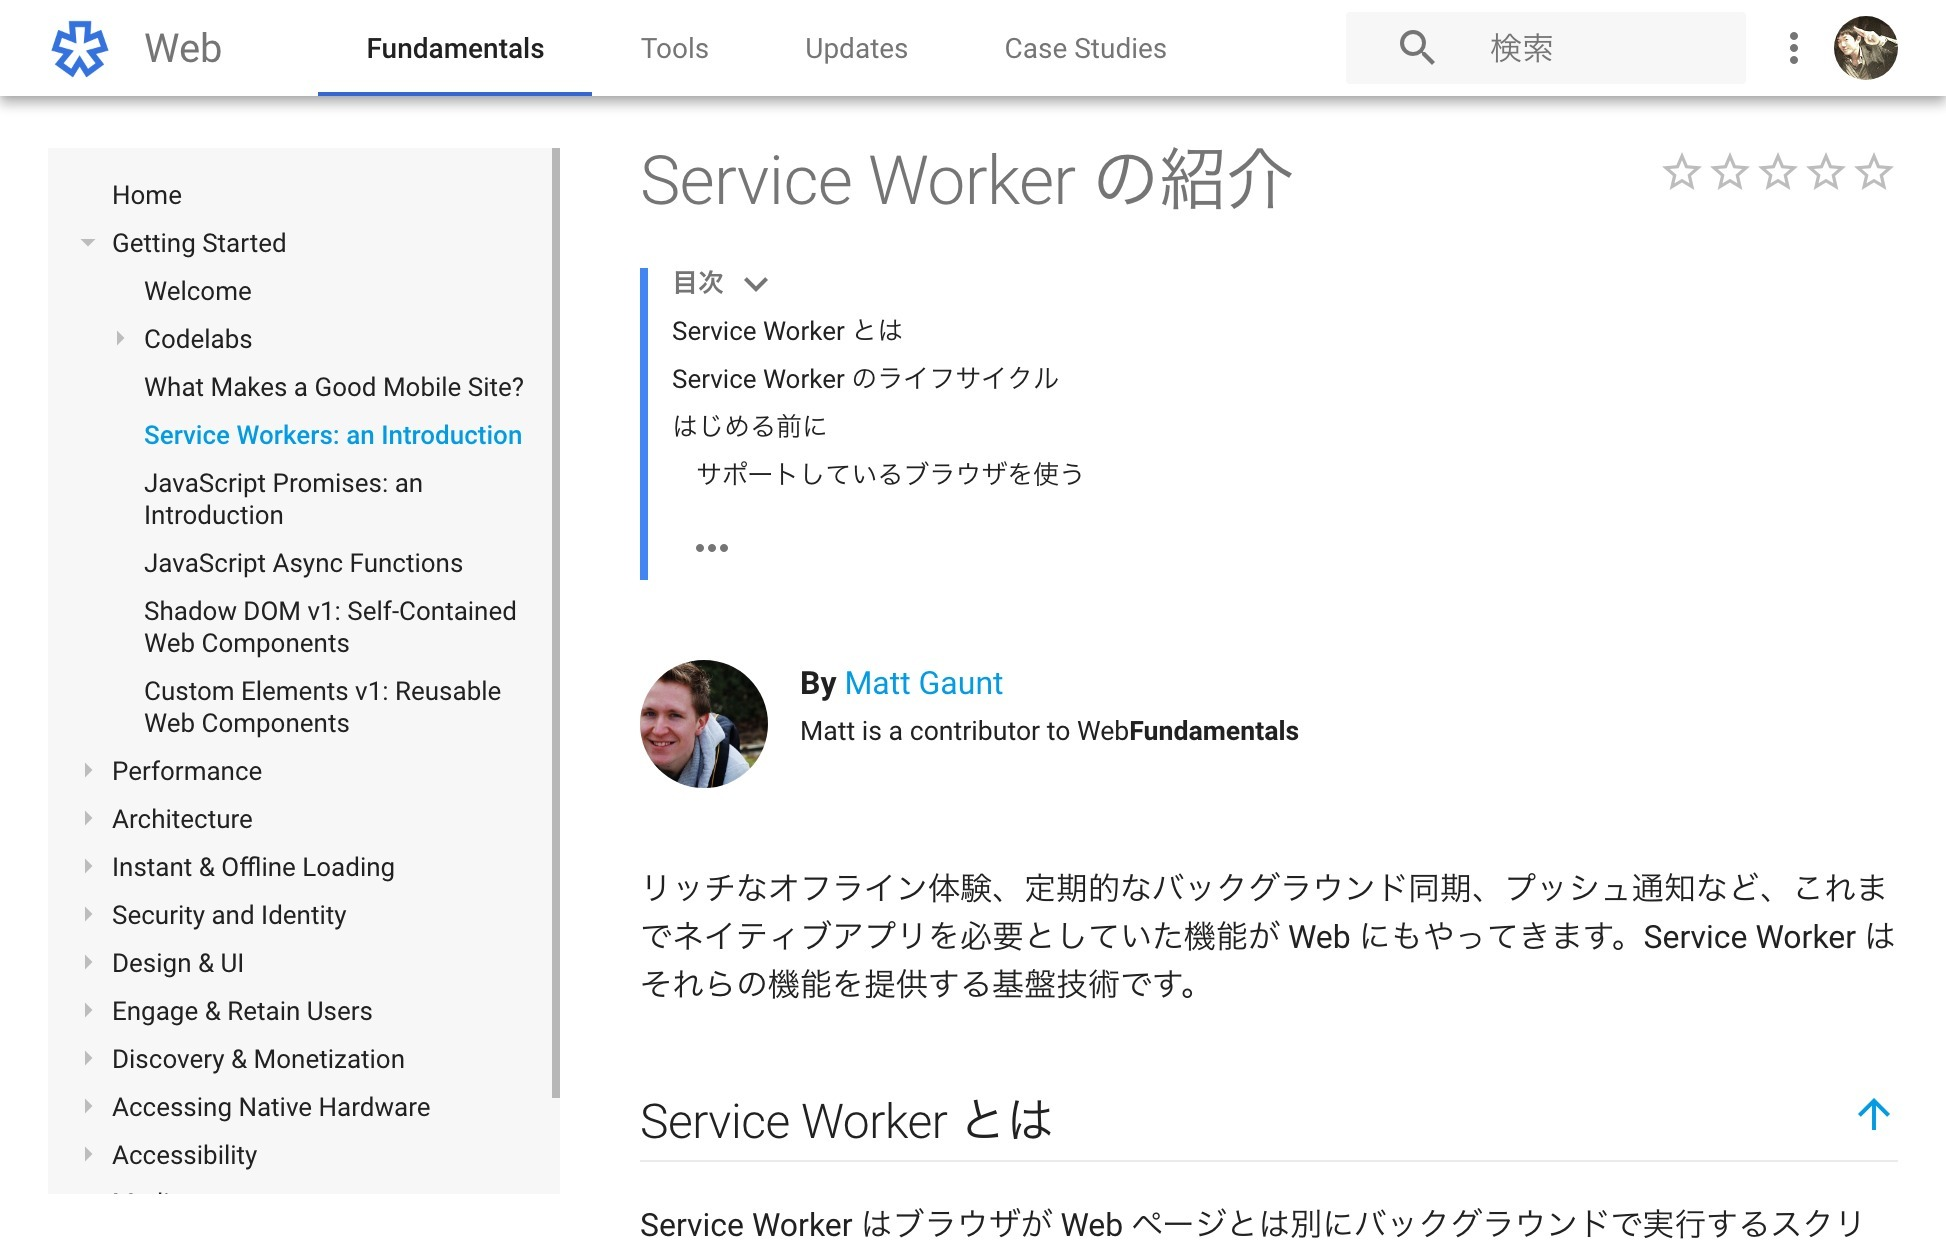 serviceworker.jpg